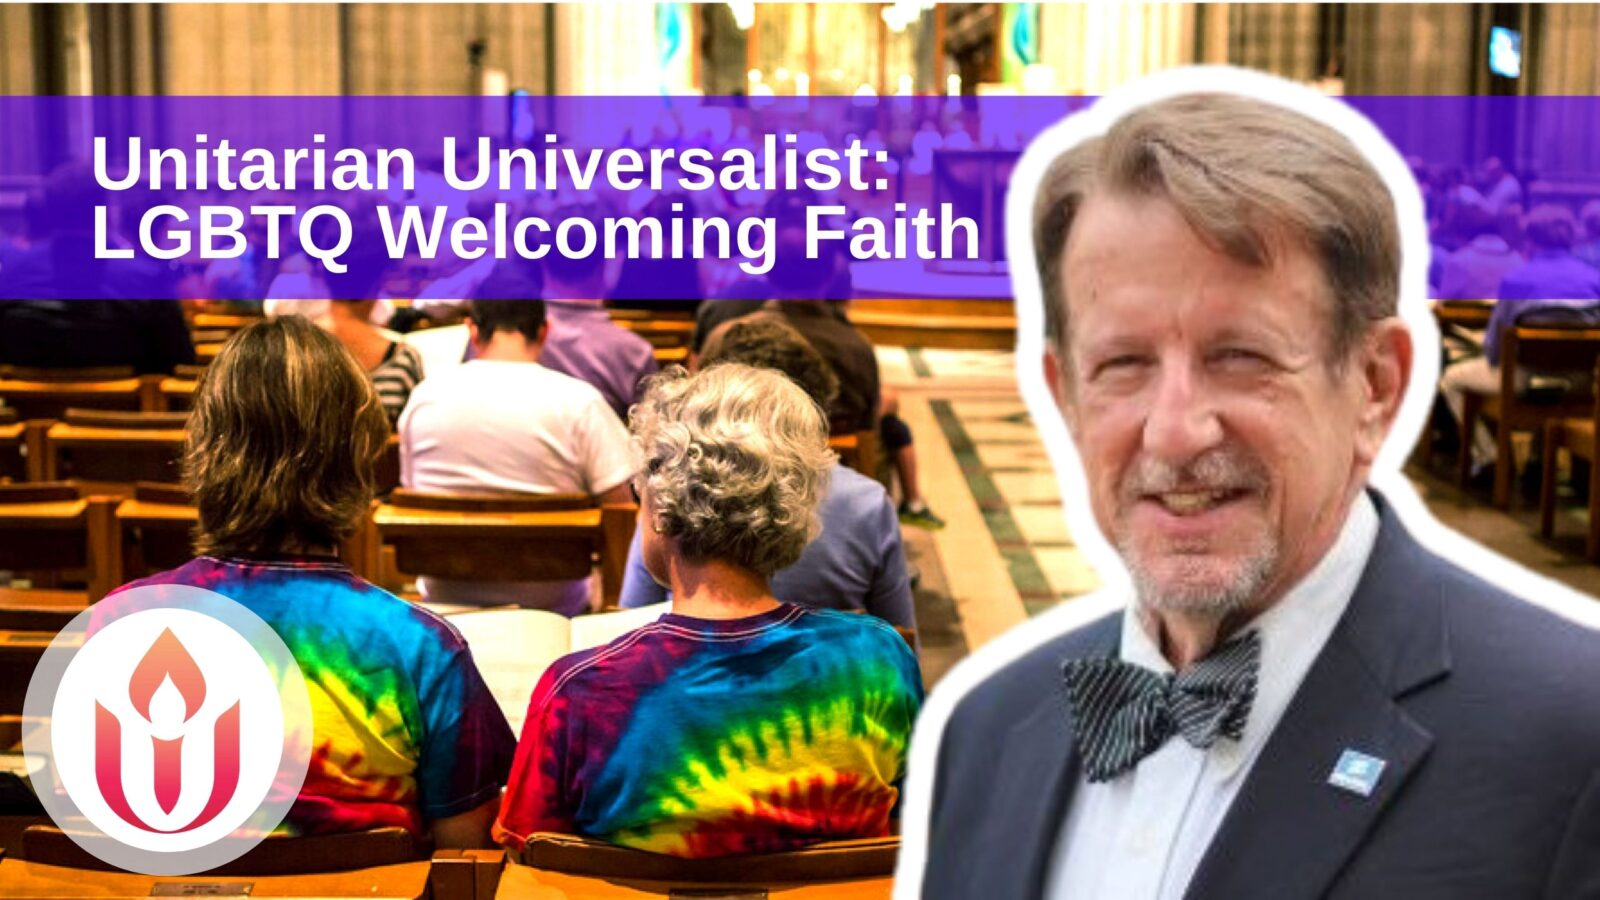 Bruce Knotts Unitarian Universalist Church LGBTQ welcoming spiritual faith gay lesbian bisexual transgender queer LGBT professional online community OutBuro